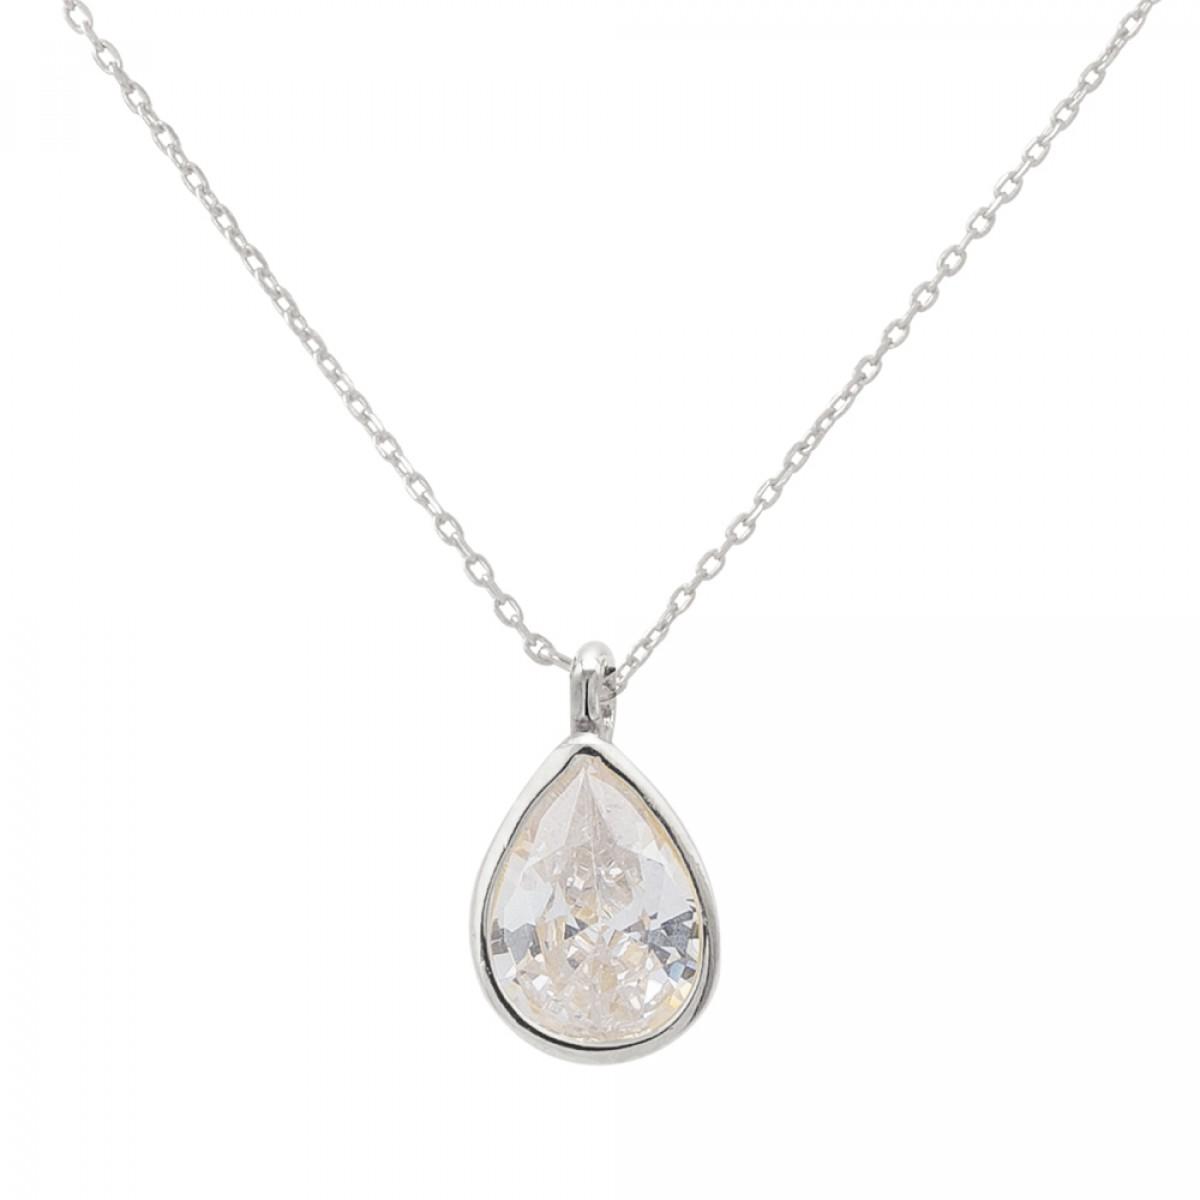 Anoa Kette Smilla 925 Sterling Silber